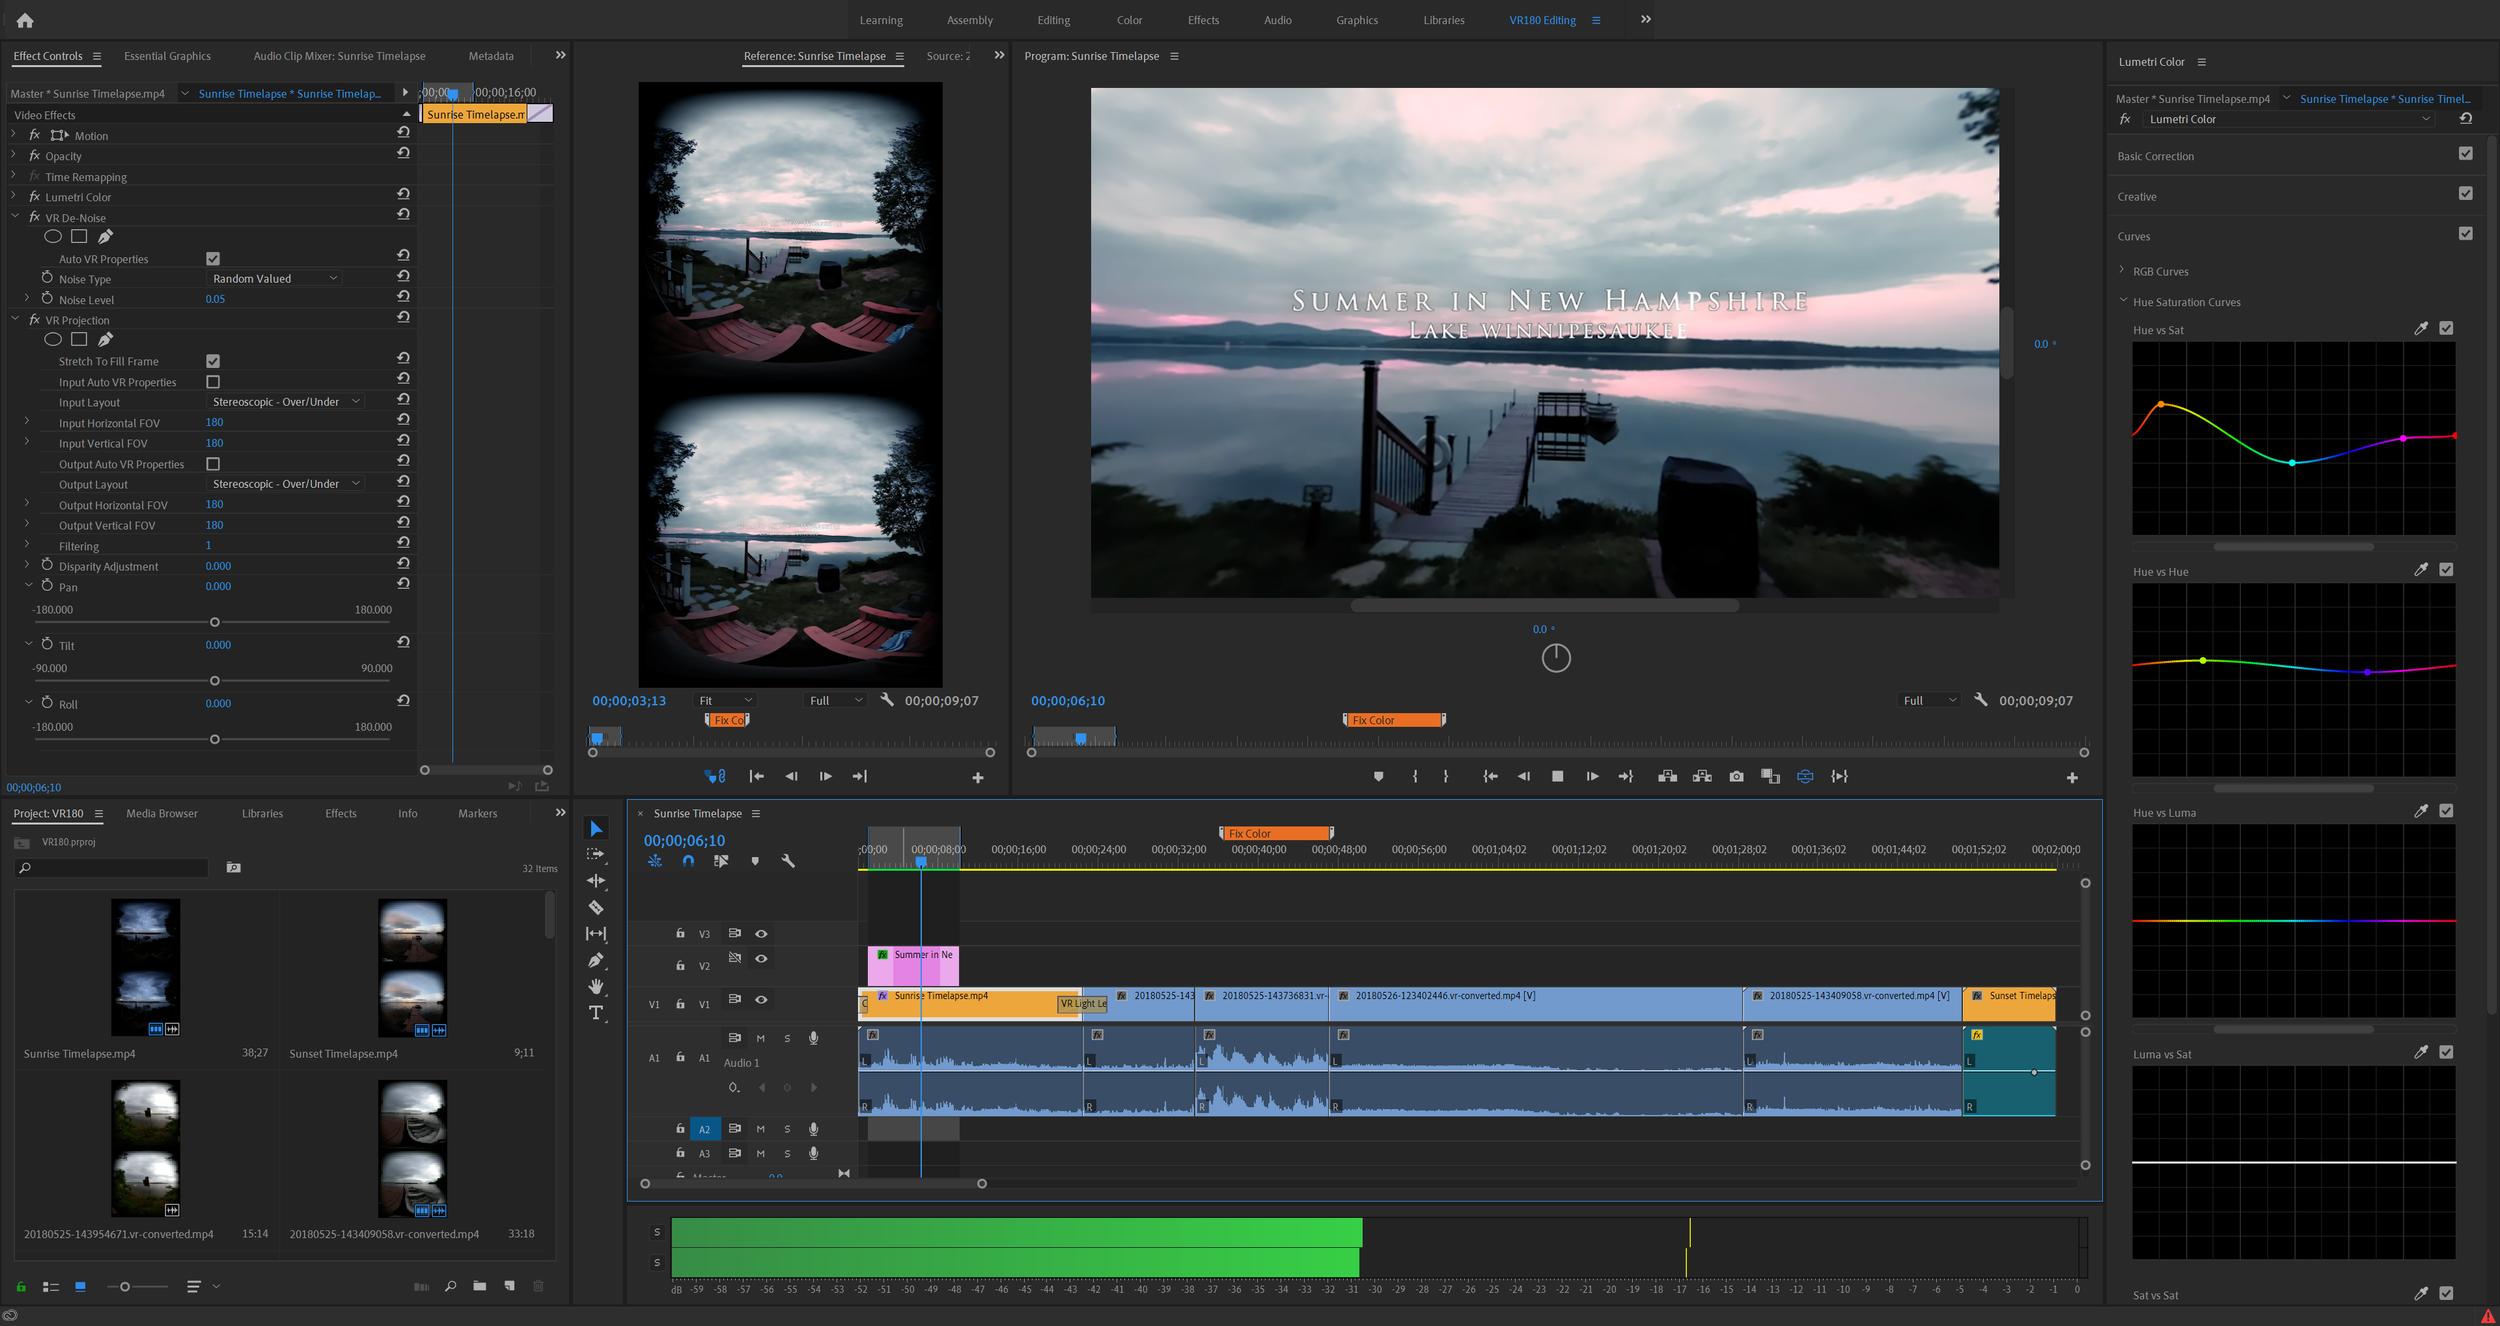 IBC 2018: Adobe Announces New Premiere Pro CC Updates